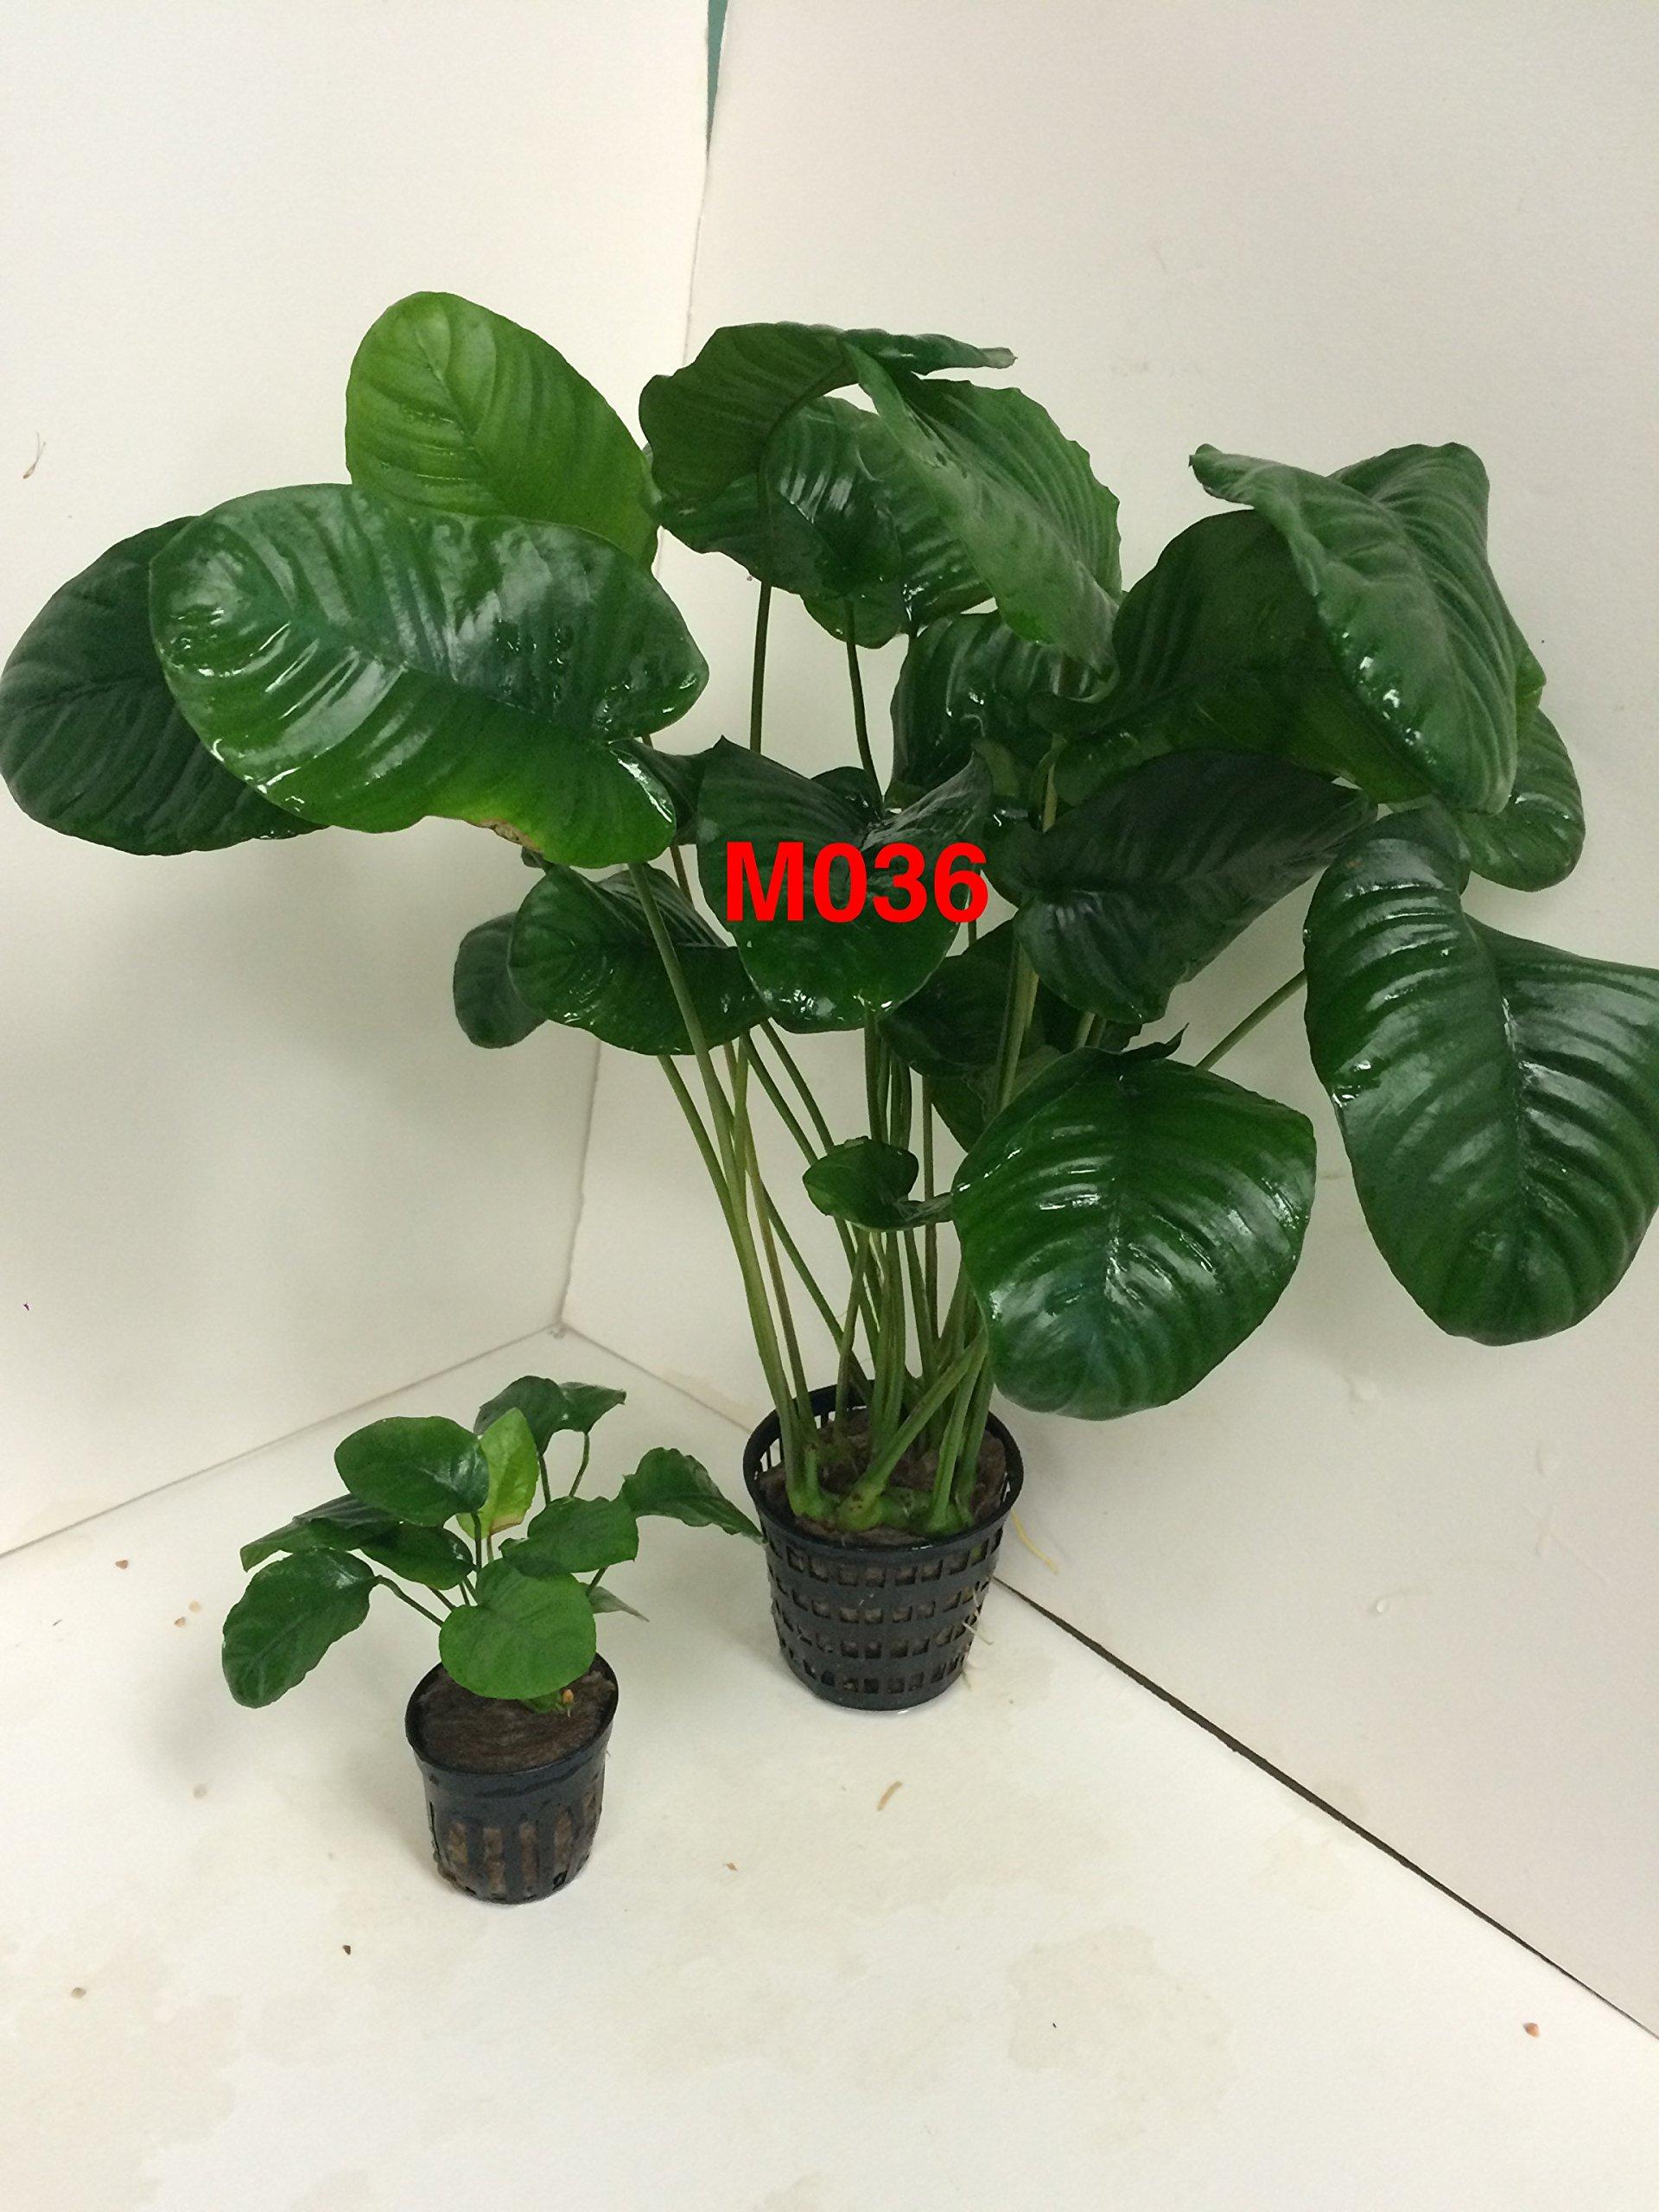 Anubias barteri 'wrinkle leave' Mother Pot Plant M036 Live Aquatic Plant by Jayco (Image #1)